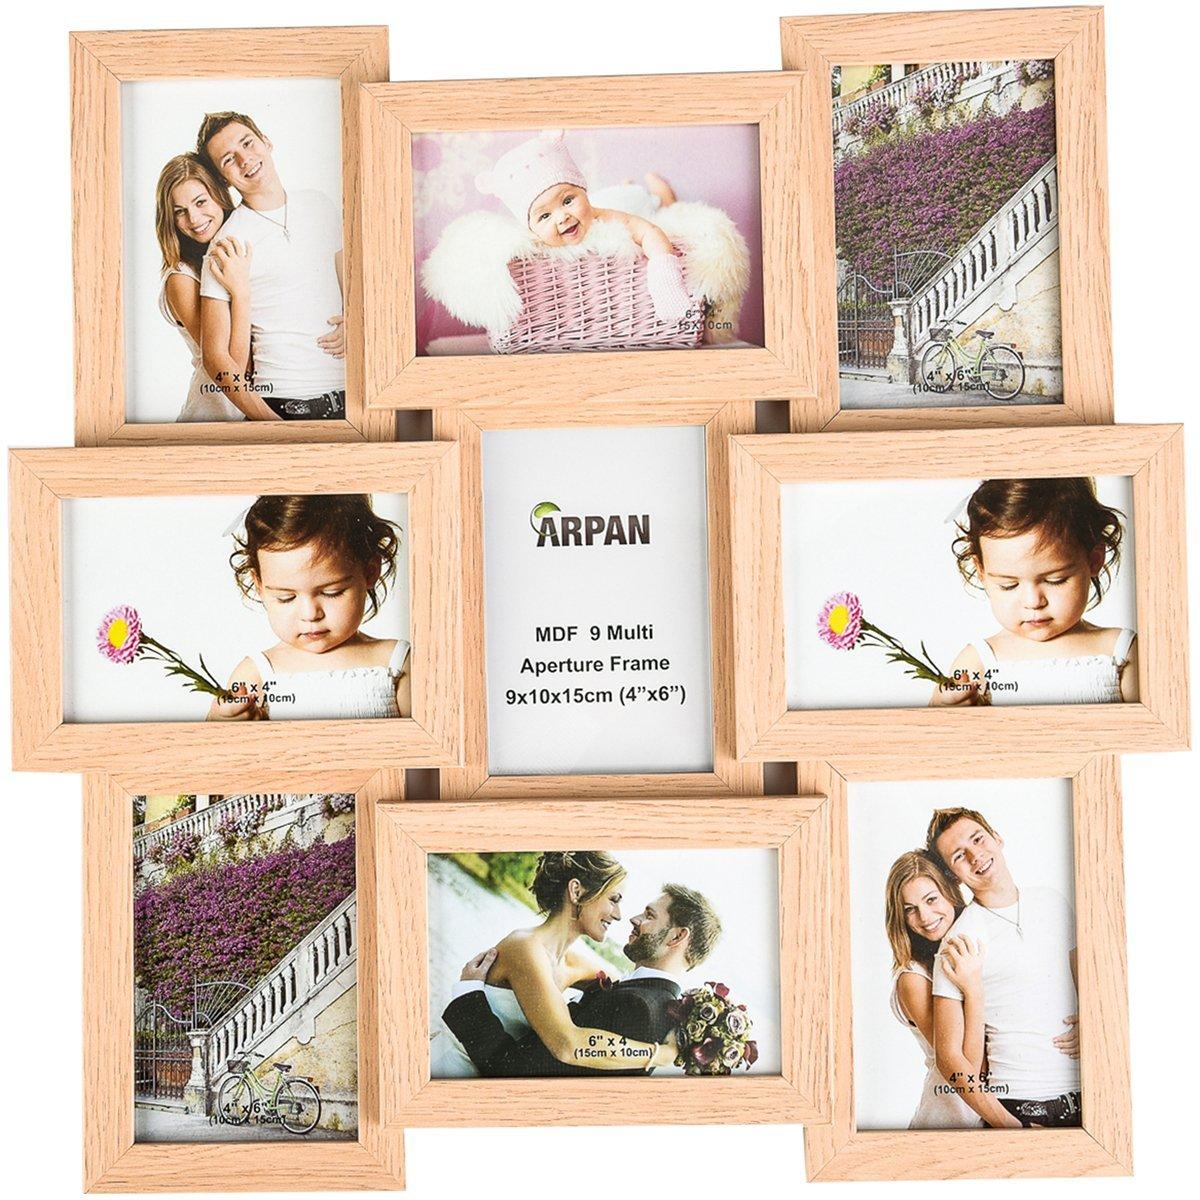 Amazon.de: Arpan MDF Multi apperture Bild/Foto Rahmen, hält 22, 9 x ...